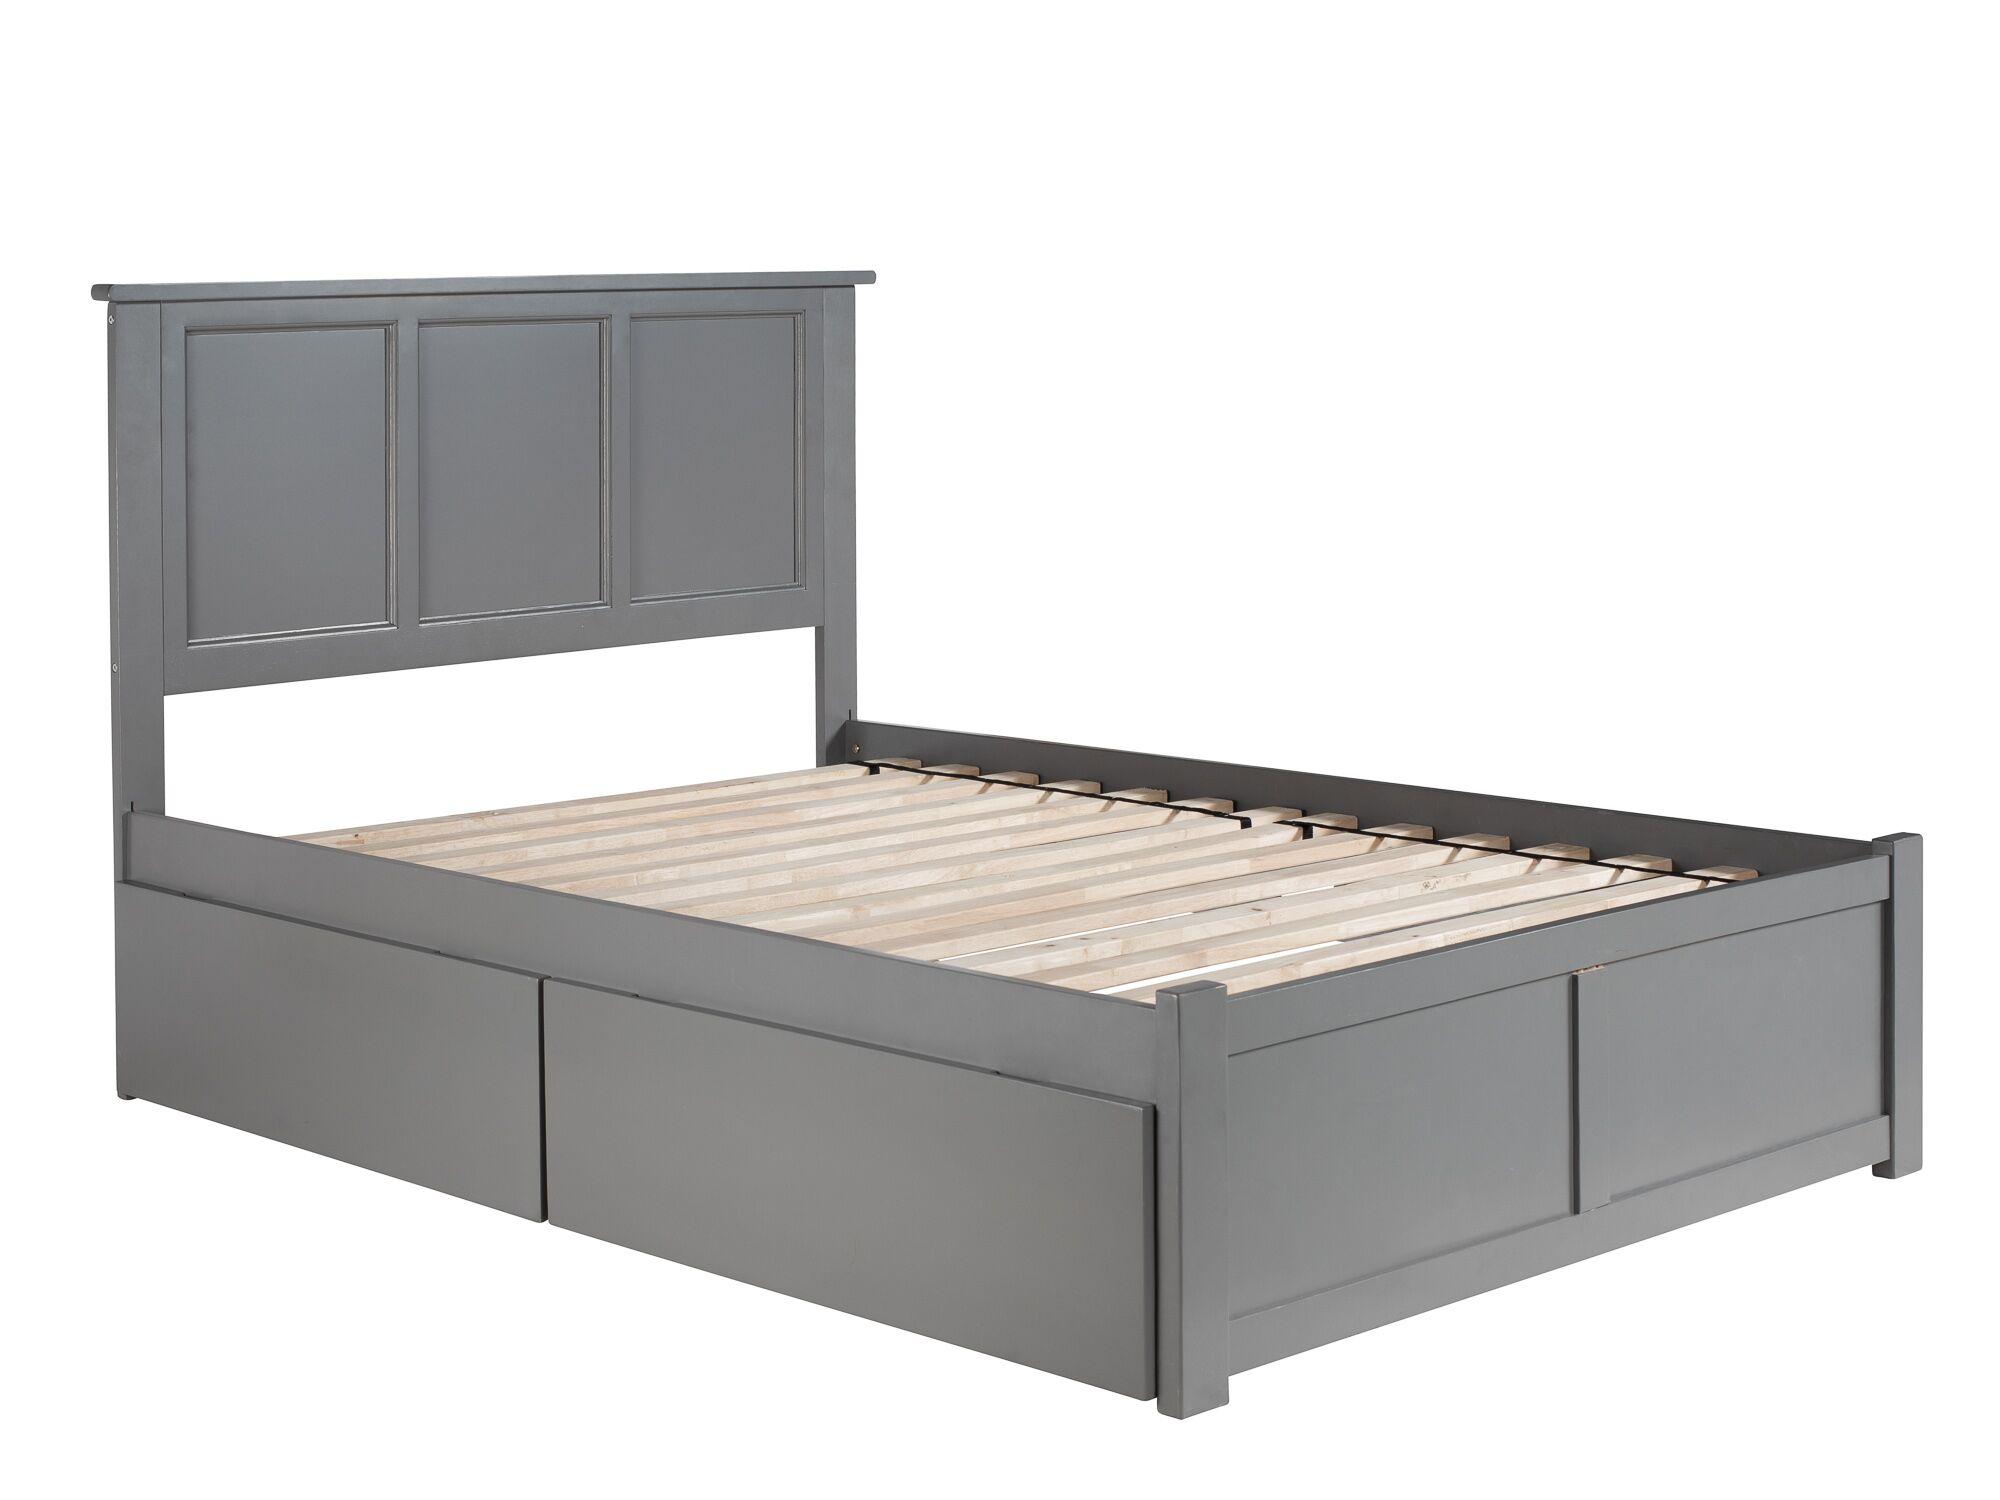 Tallmadge Storage Platform Bed Size: Full, Color: Light Gray